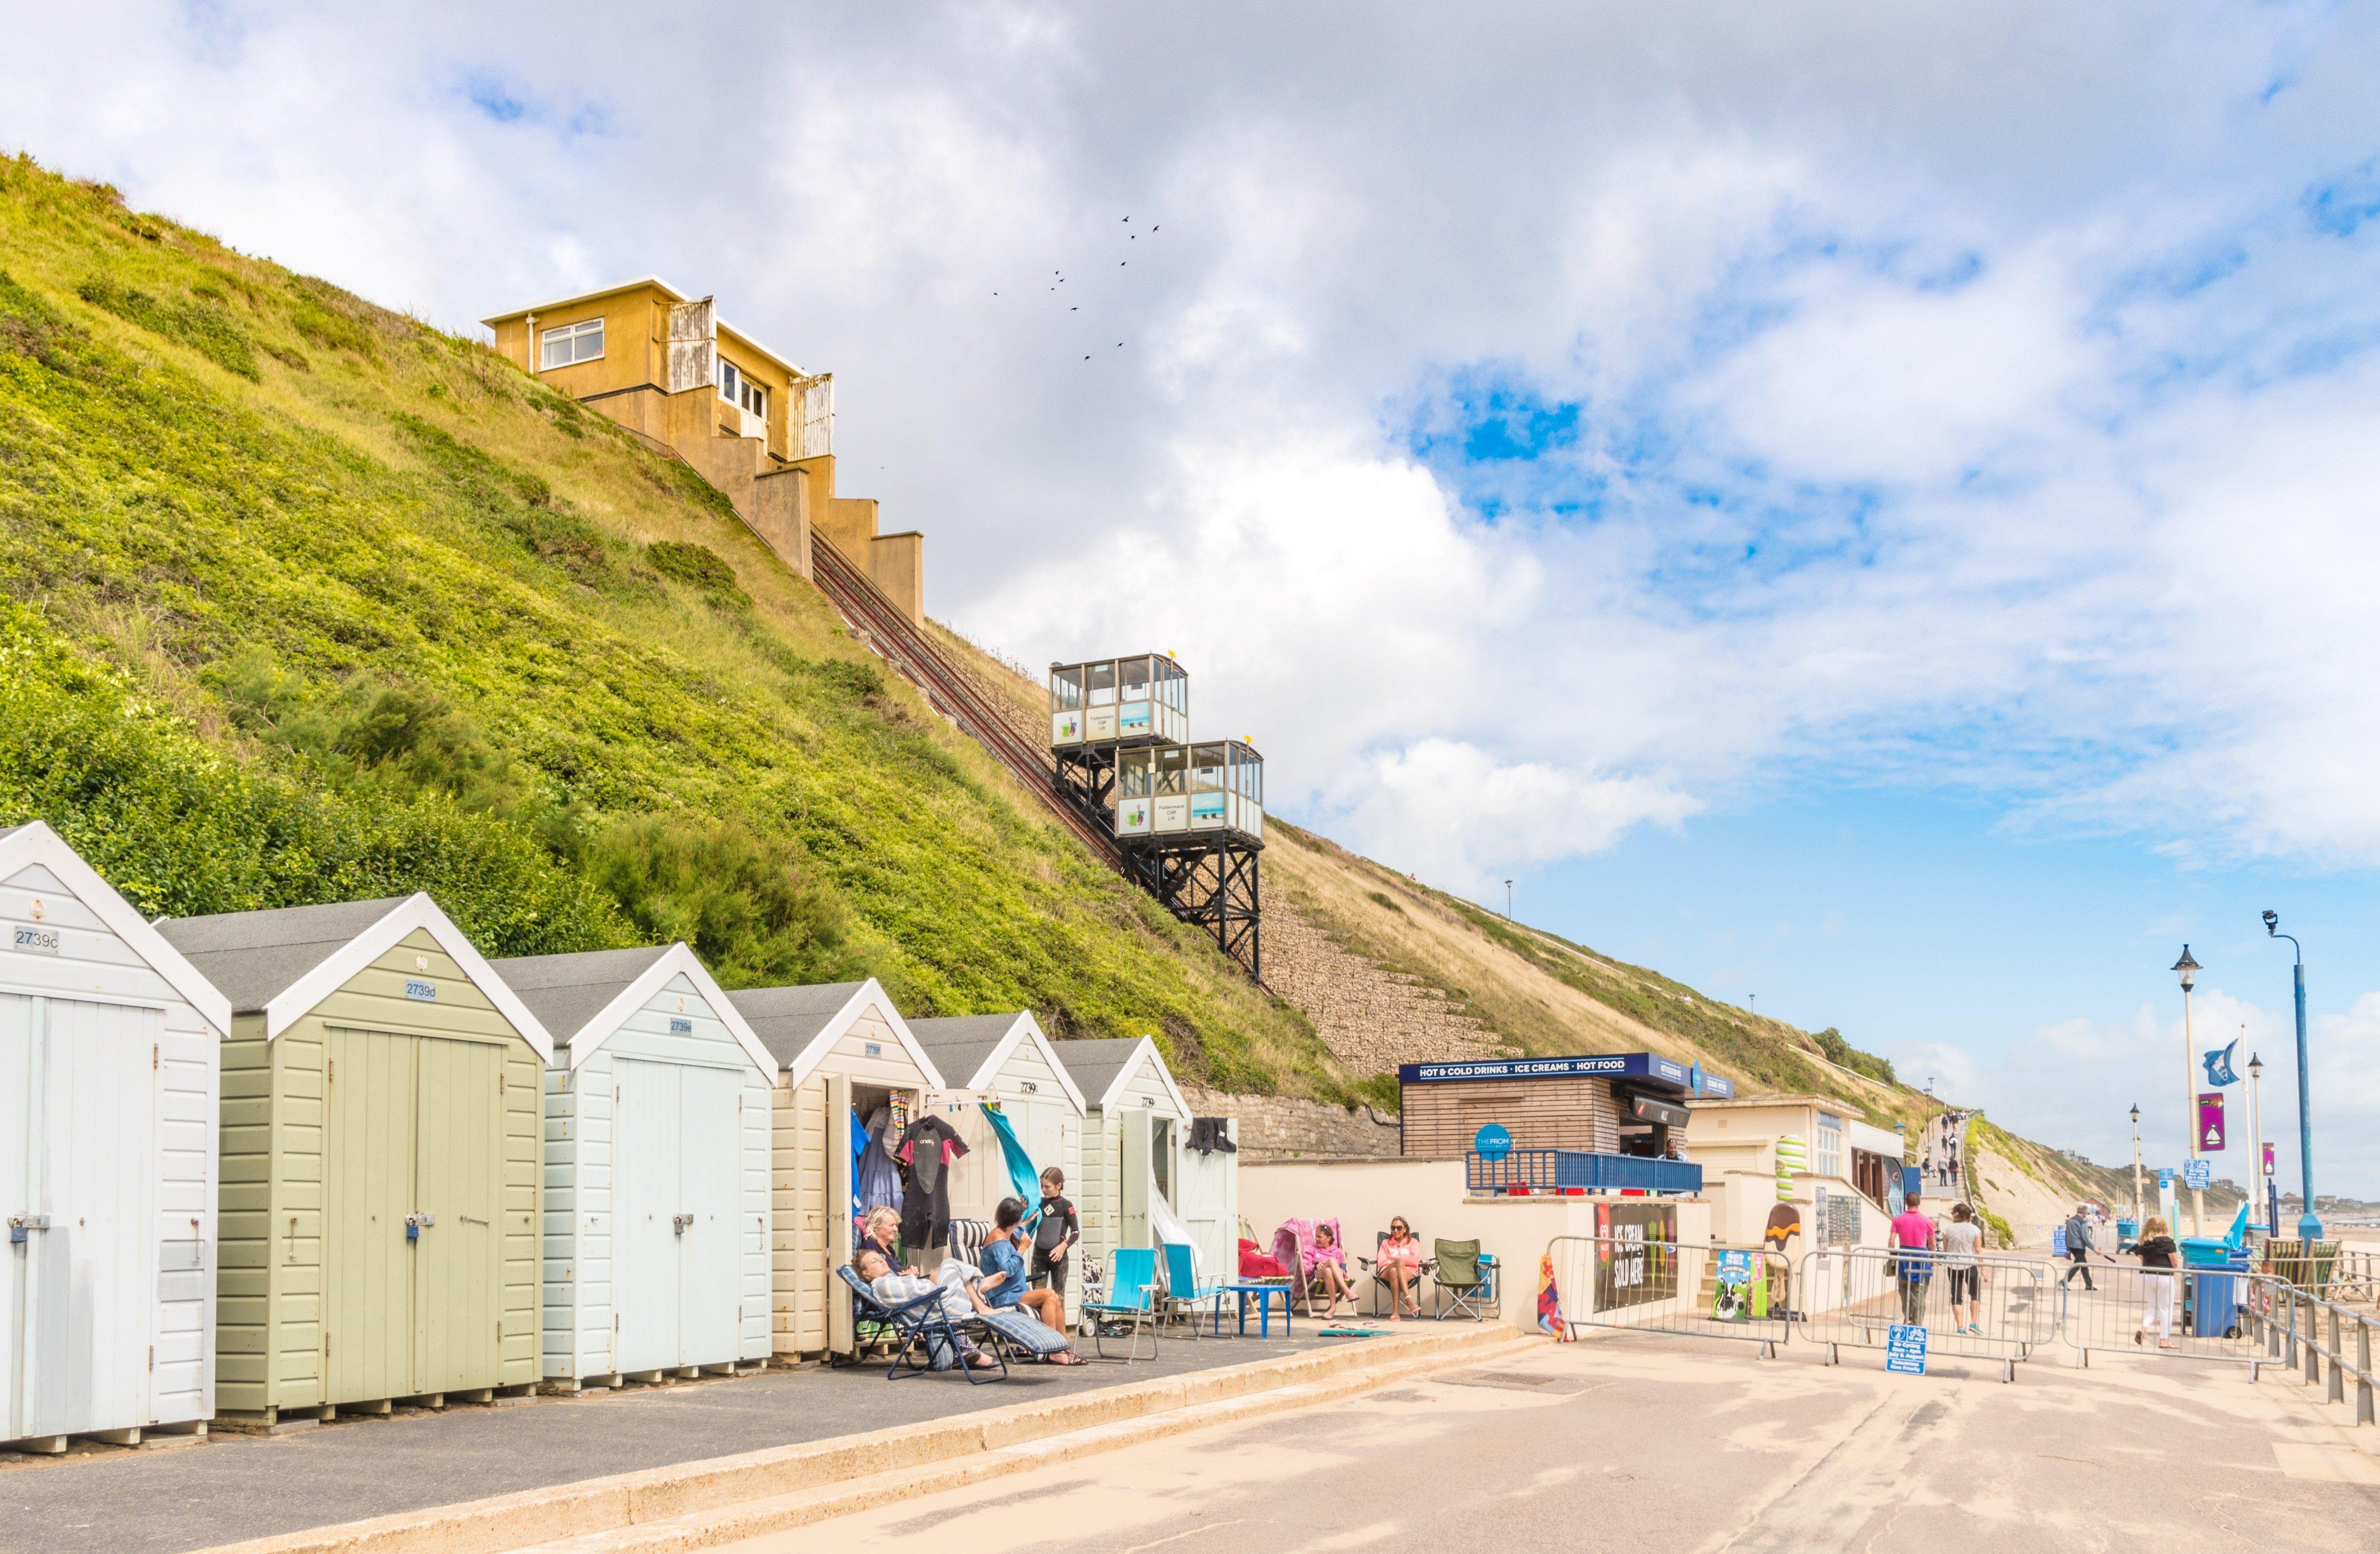 Fisherman's Walk Cliff lift railway UK